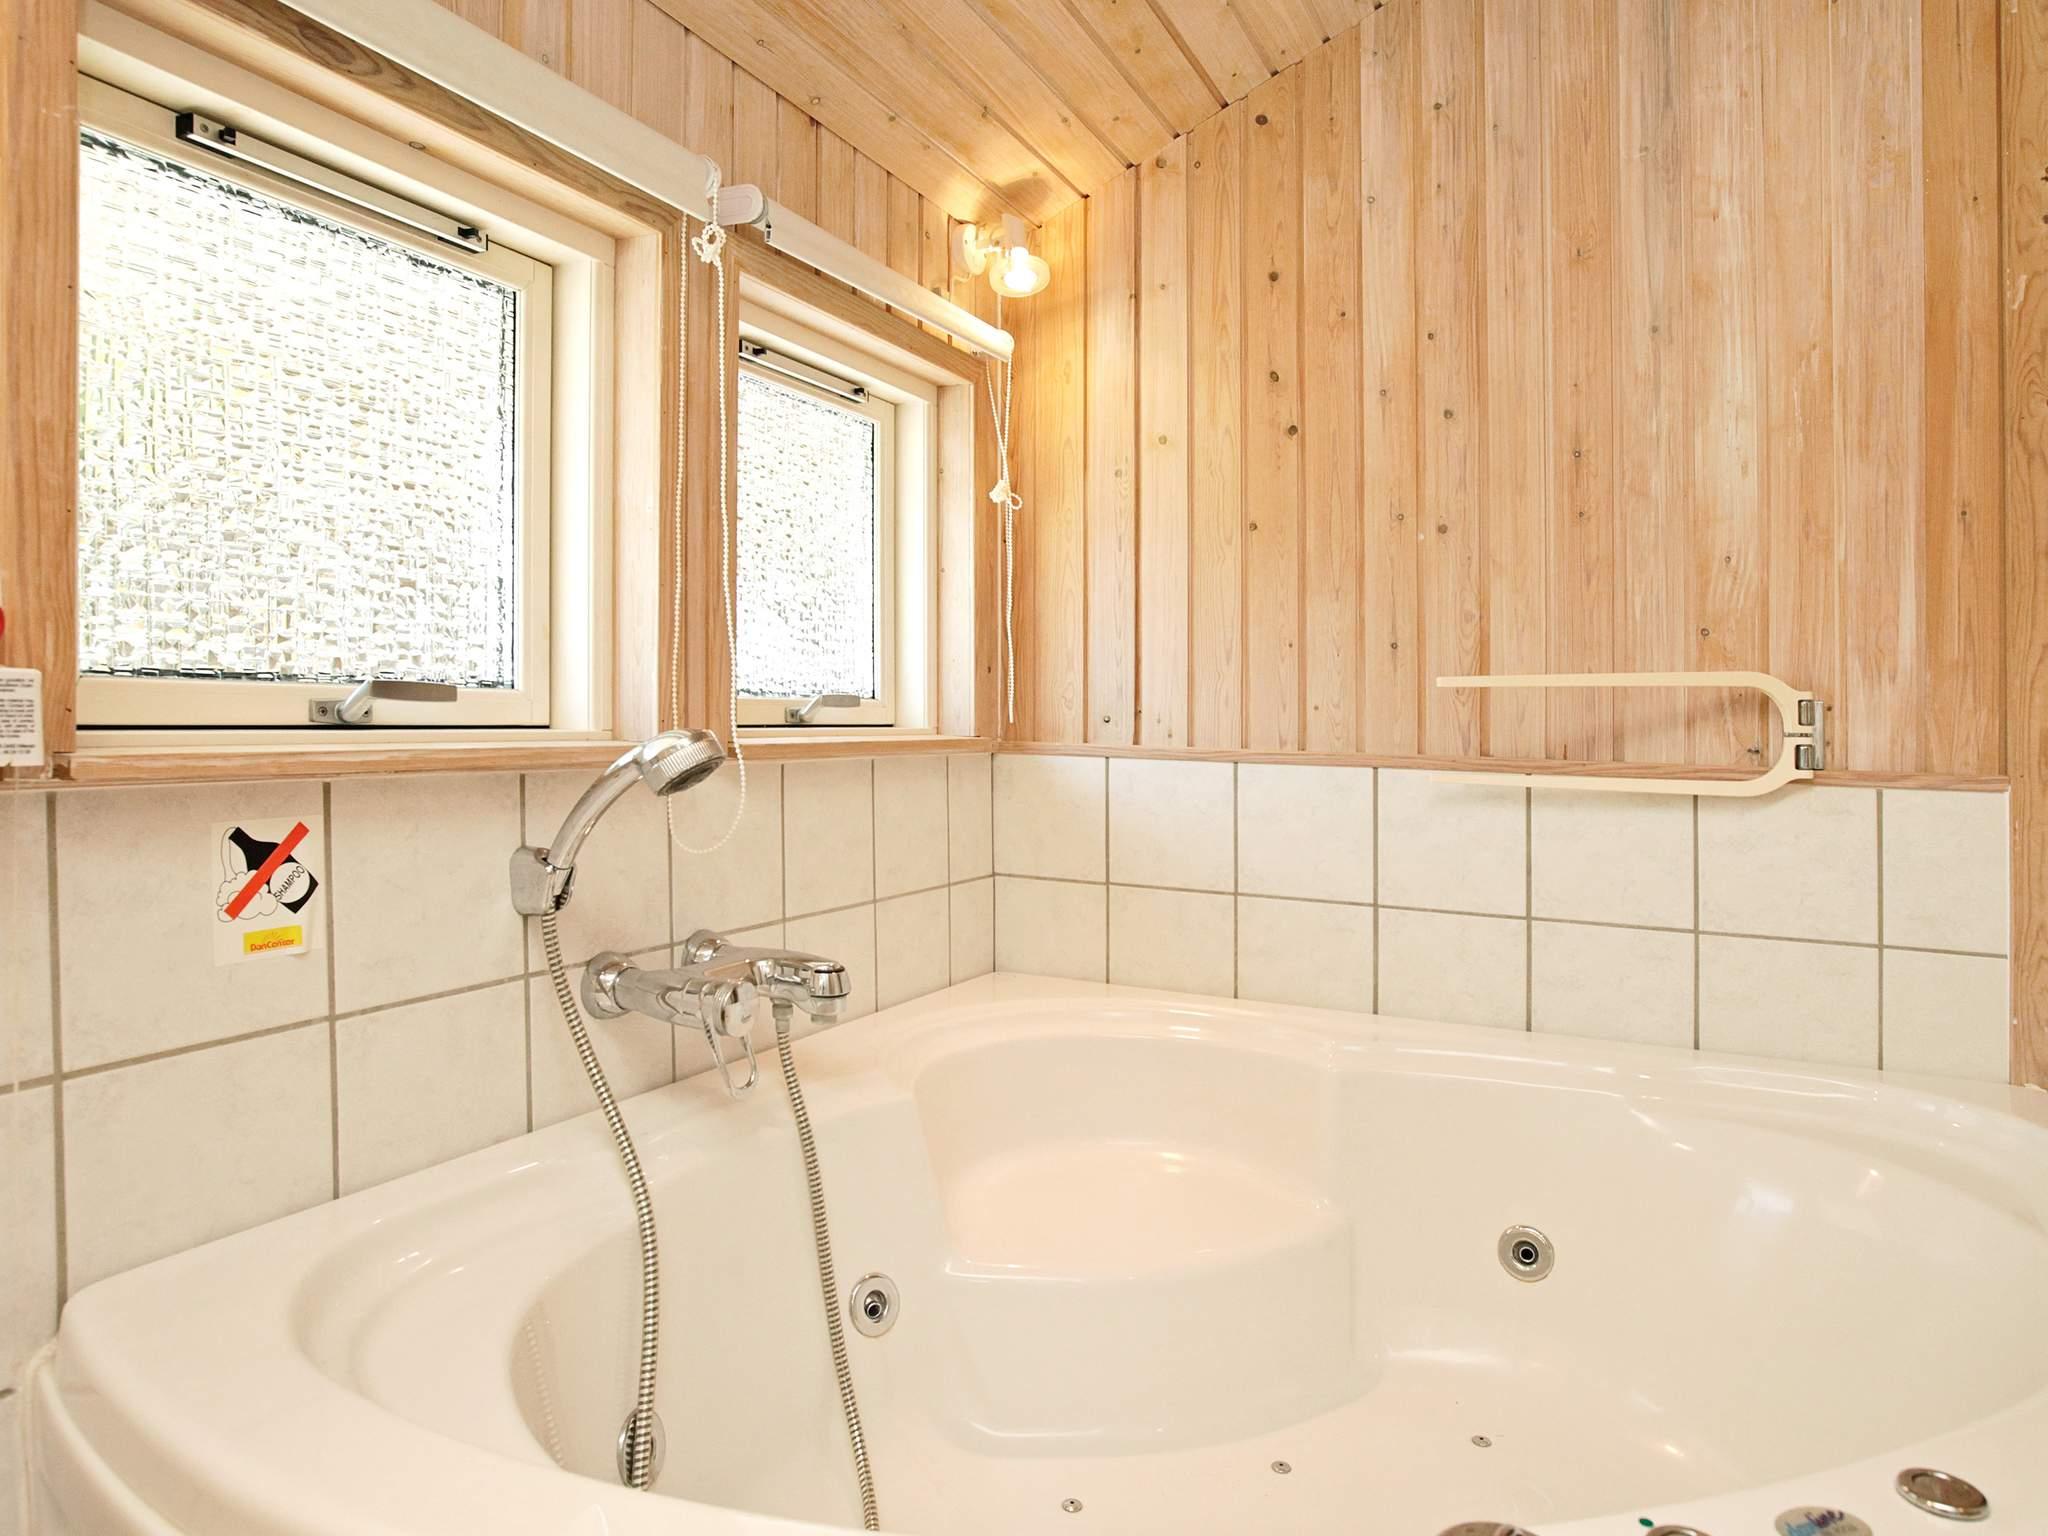 Maison de vacances Falsled (87545), Faldsled, , Fionie, Danemark, image 20